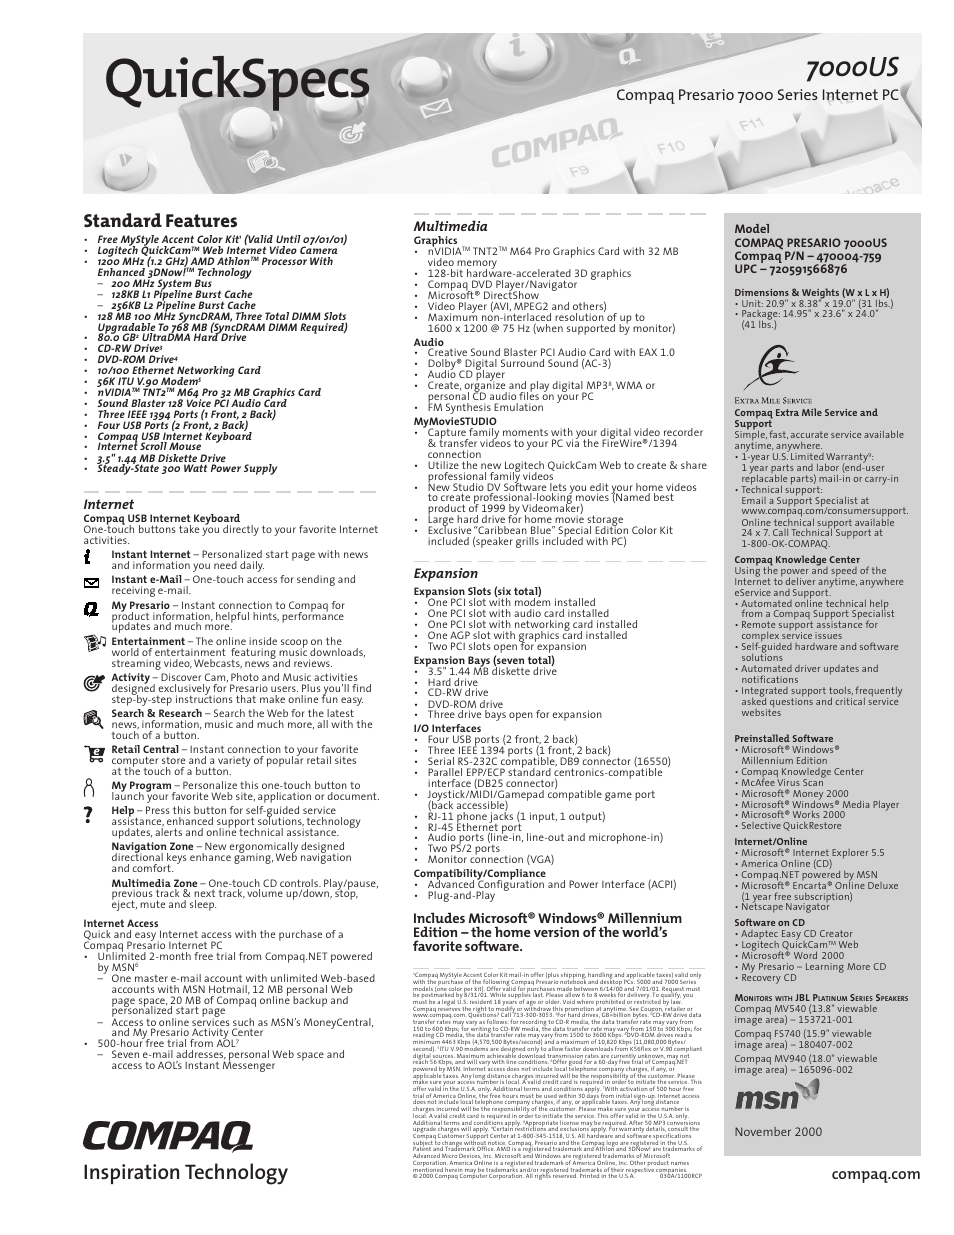 Compaq Presario 7000 Series Internet PCQuick 470004-759 User Manual | 1 page